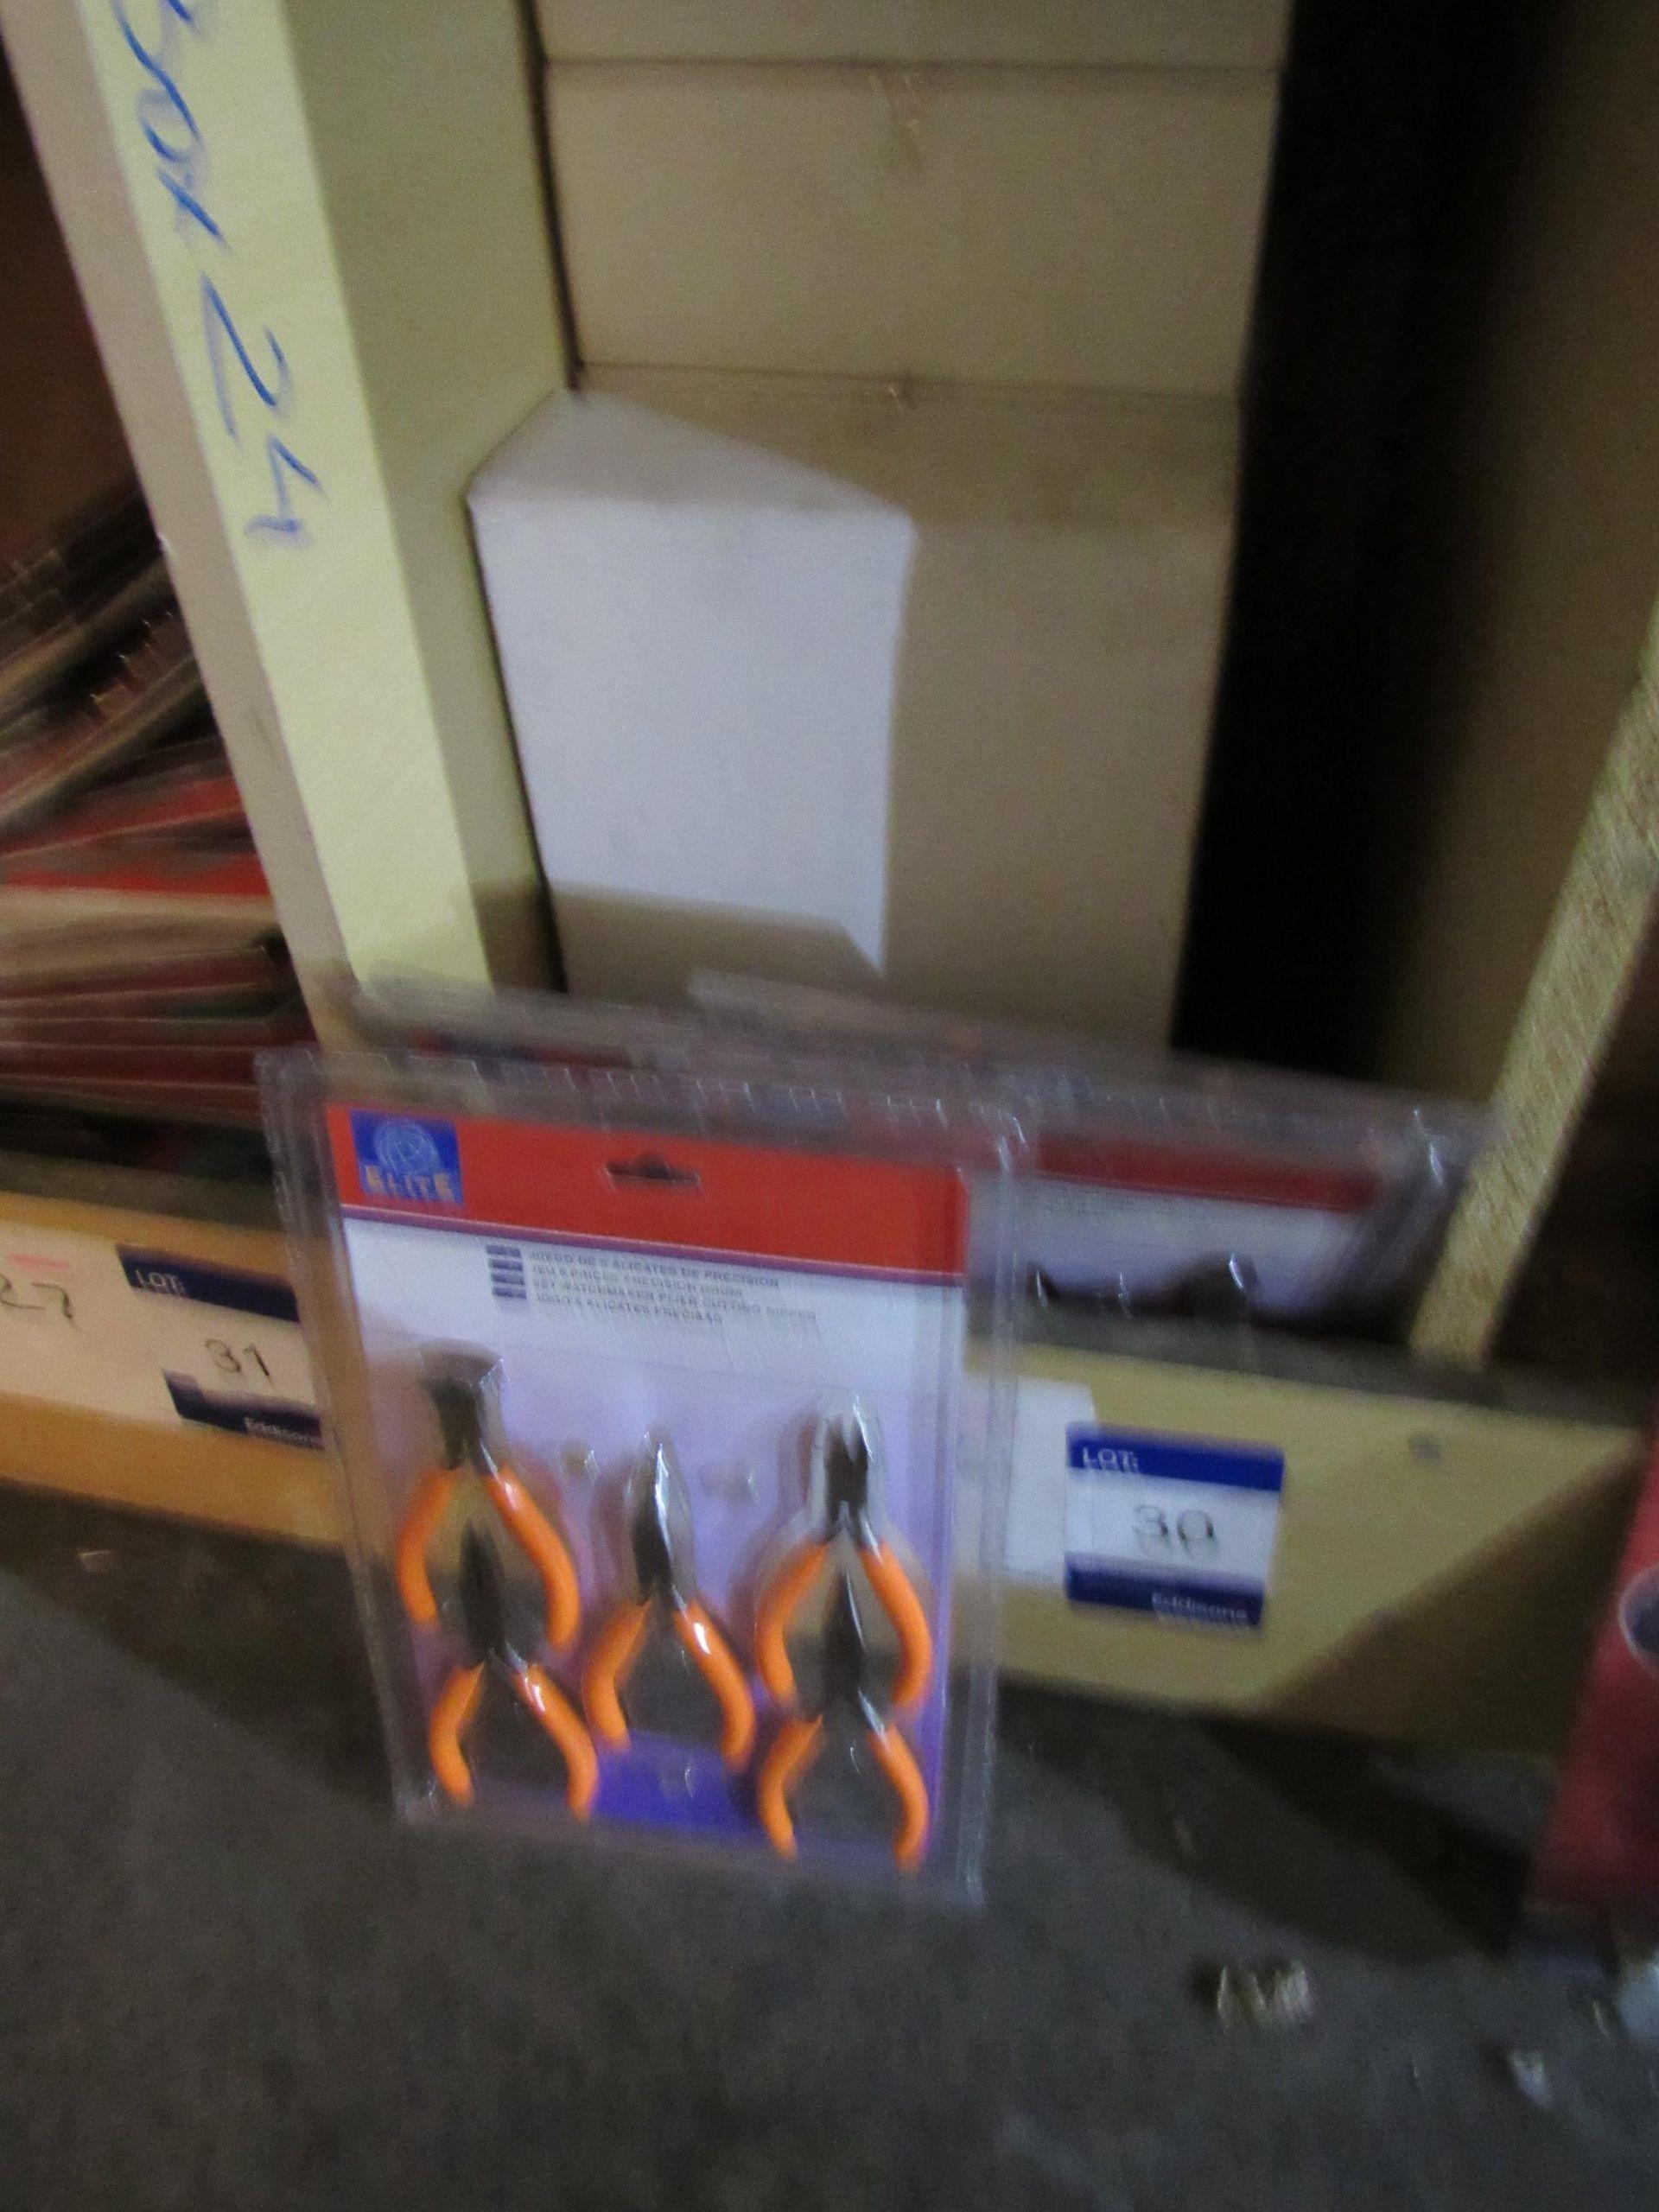 Lot 30 - 47 10022 MINI PLIERS SET - Orange